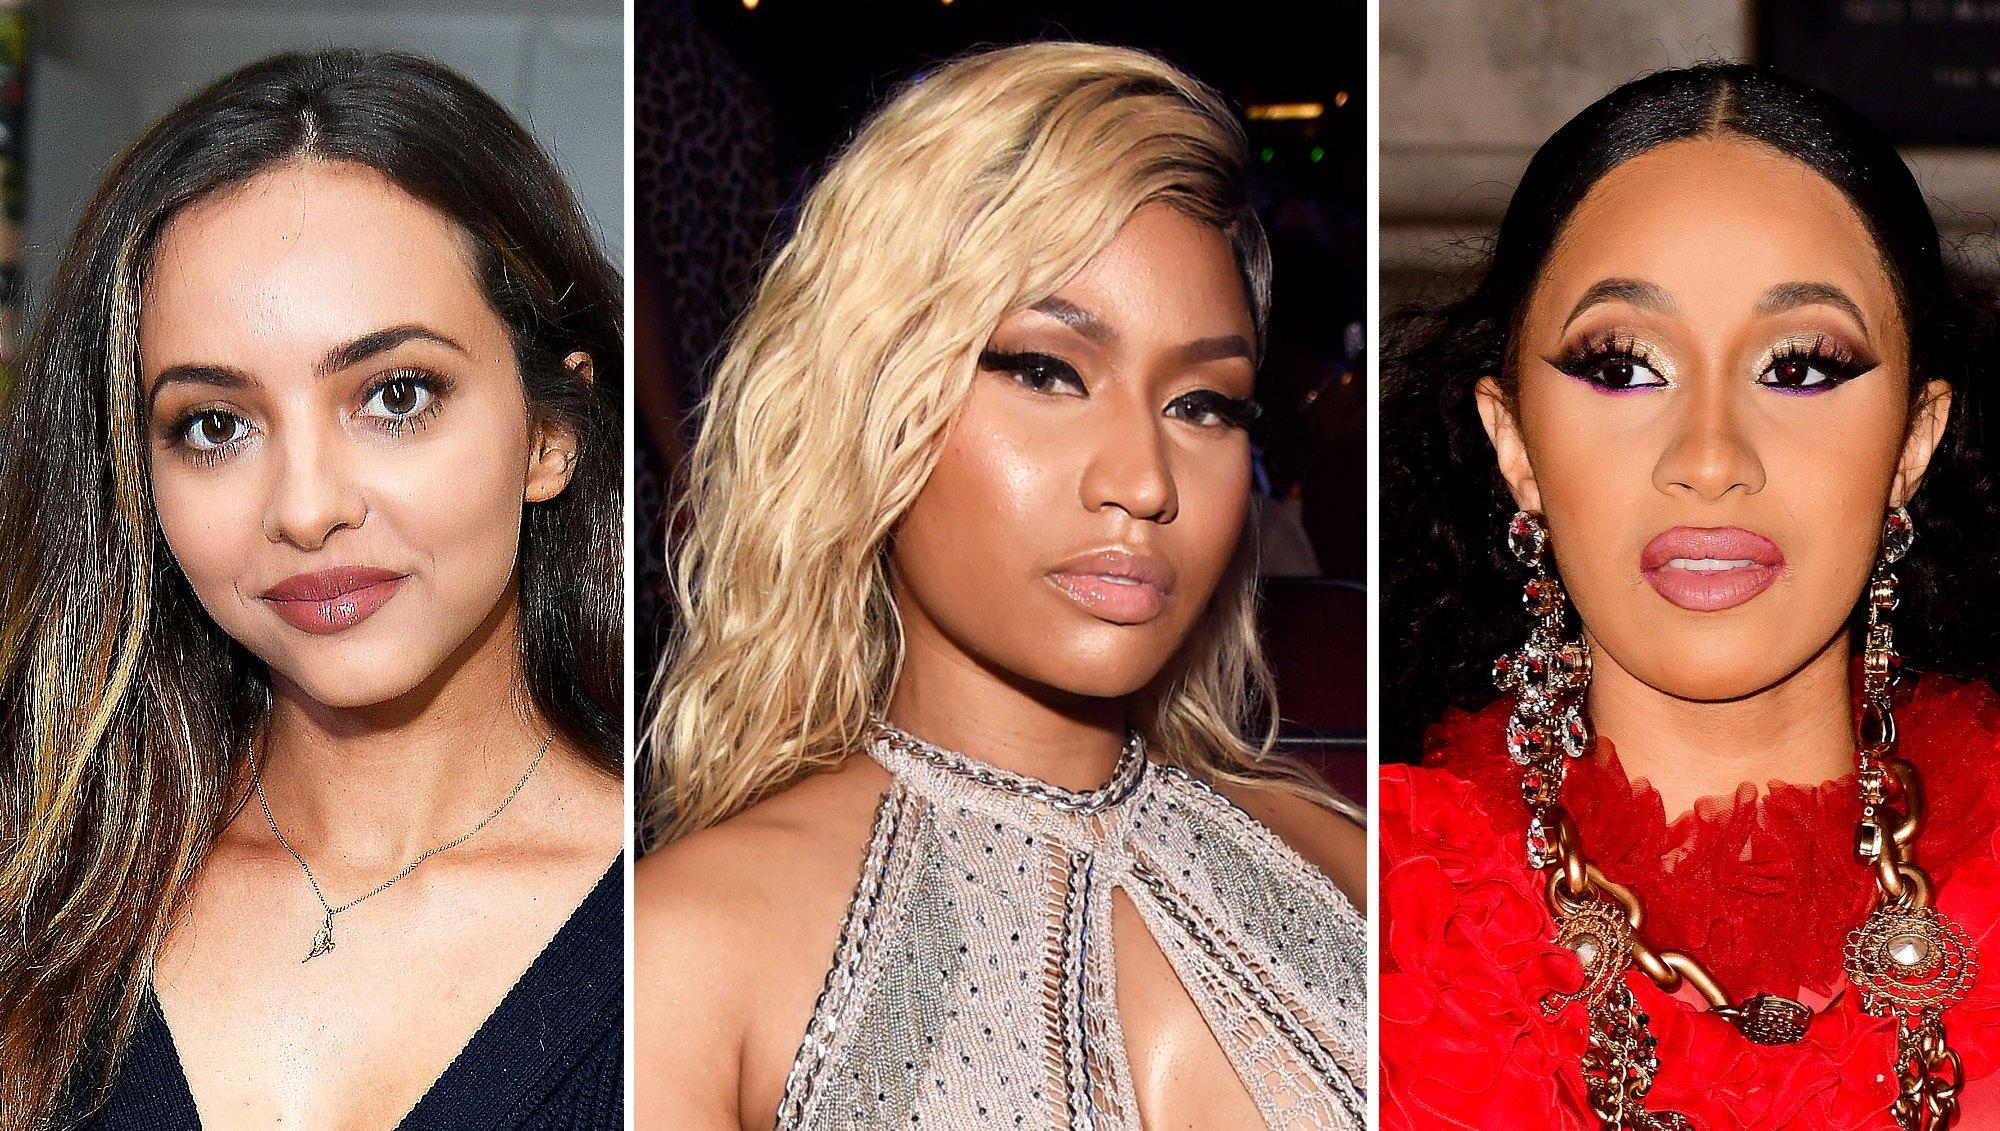 Jade Thirlwall, Nicki Minaj and Cardi B